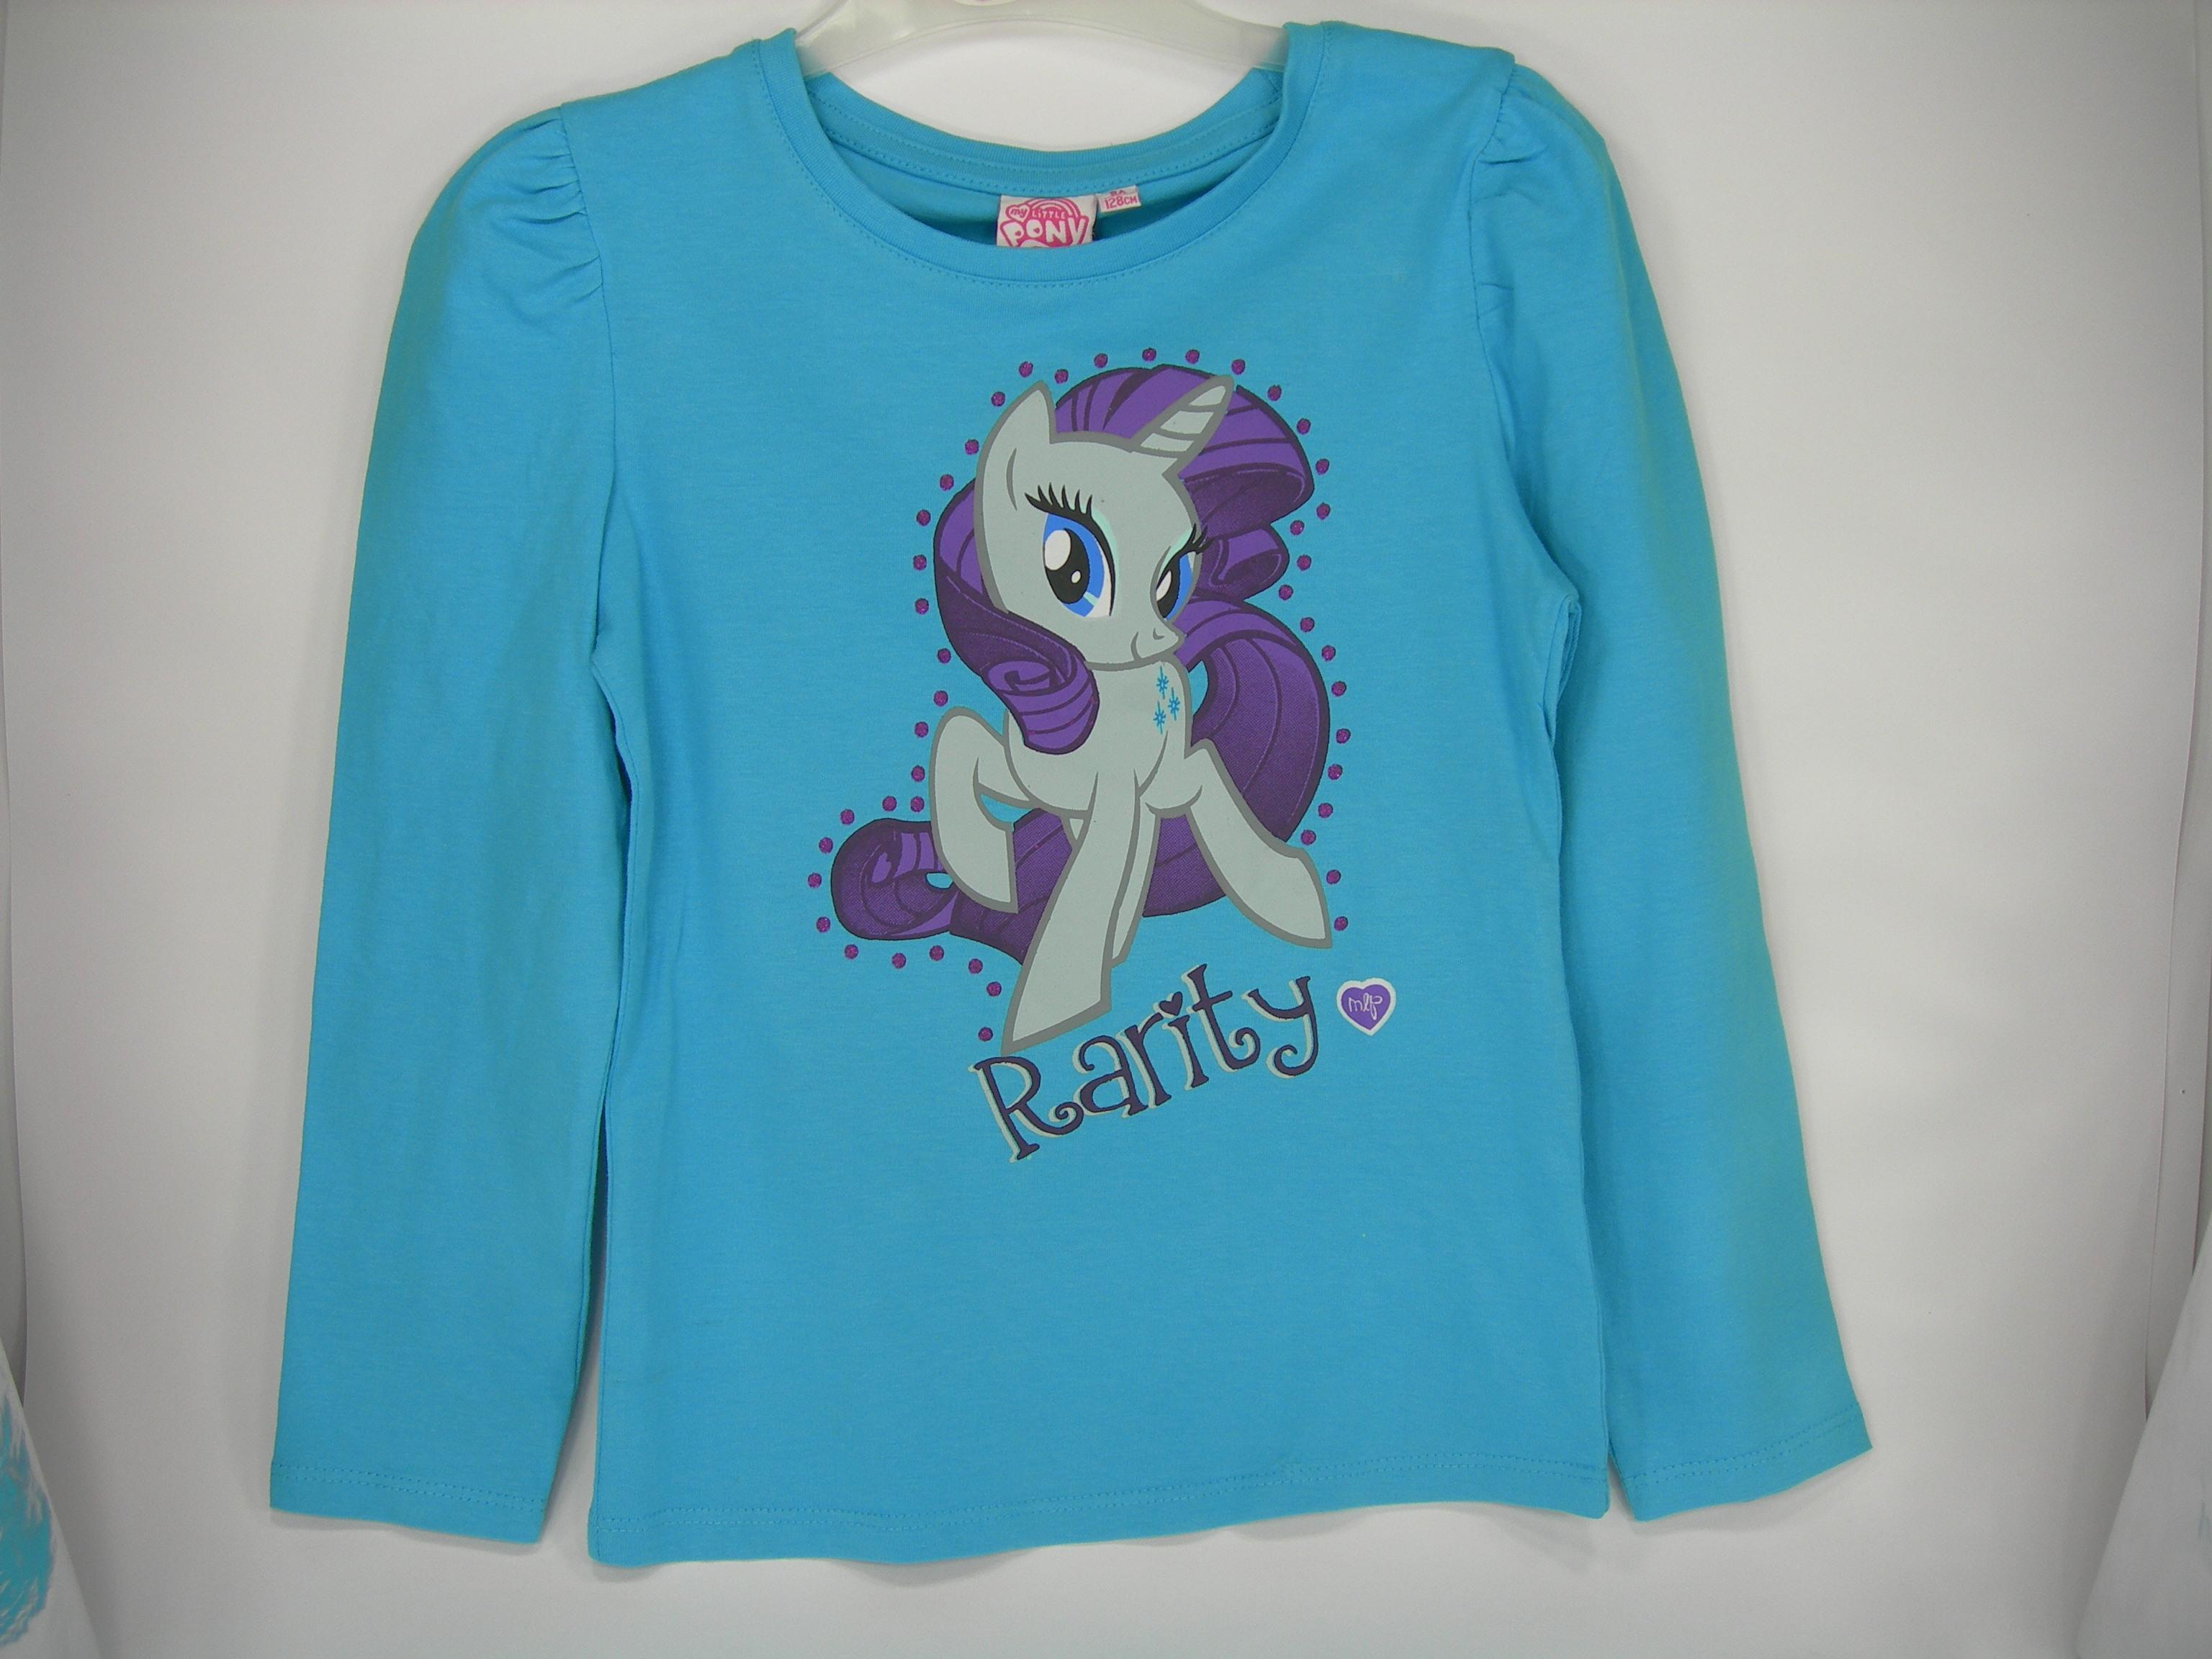 My Little Pony Maglia T-Shirt bimba manica lunga cotone da 4 a 10 anni Bambina